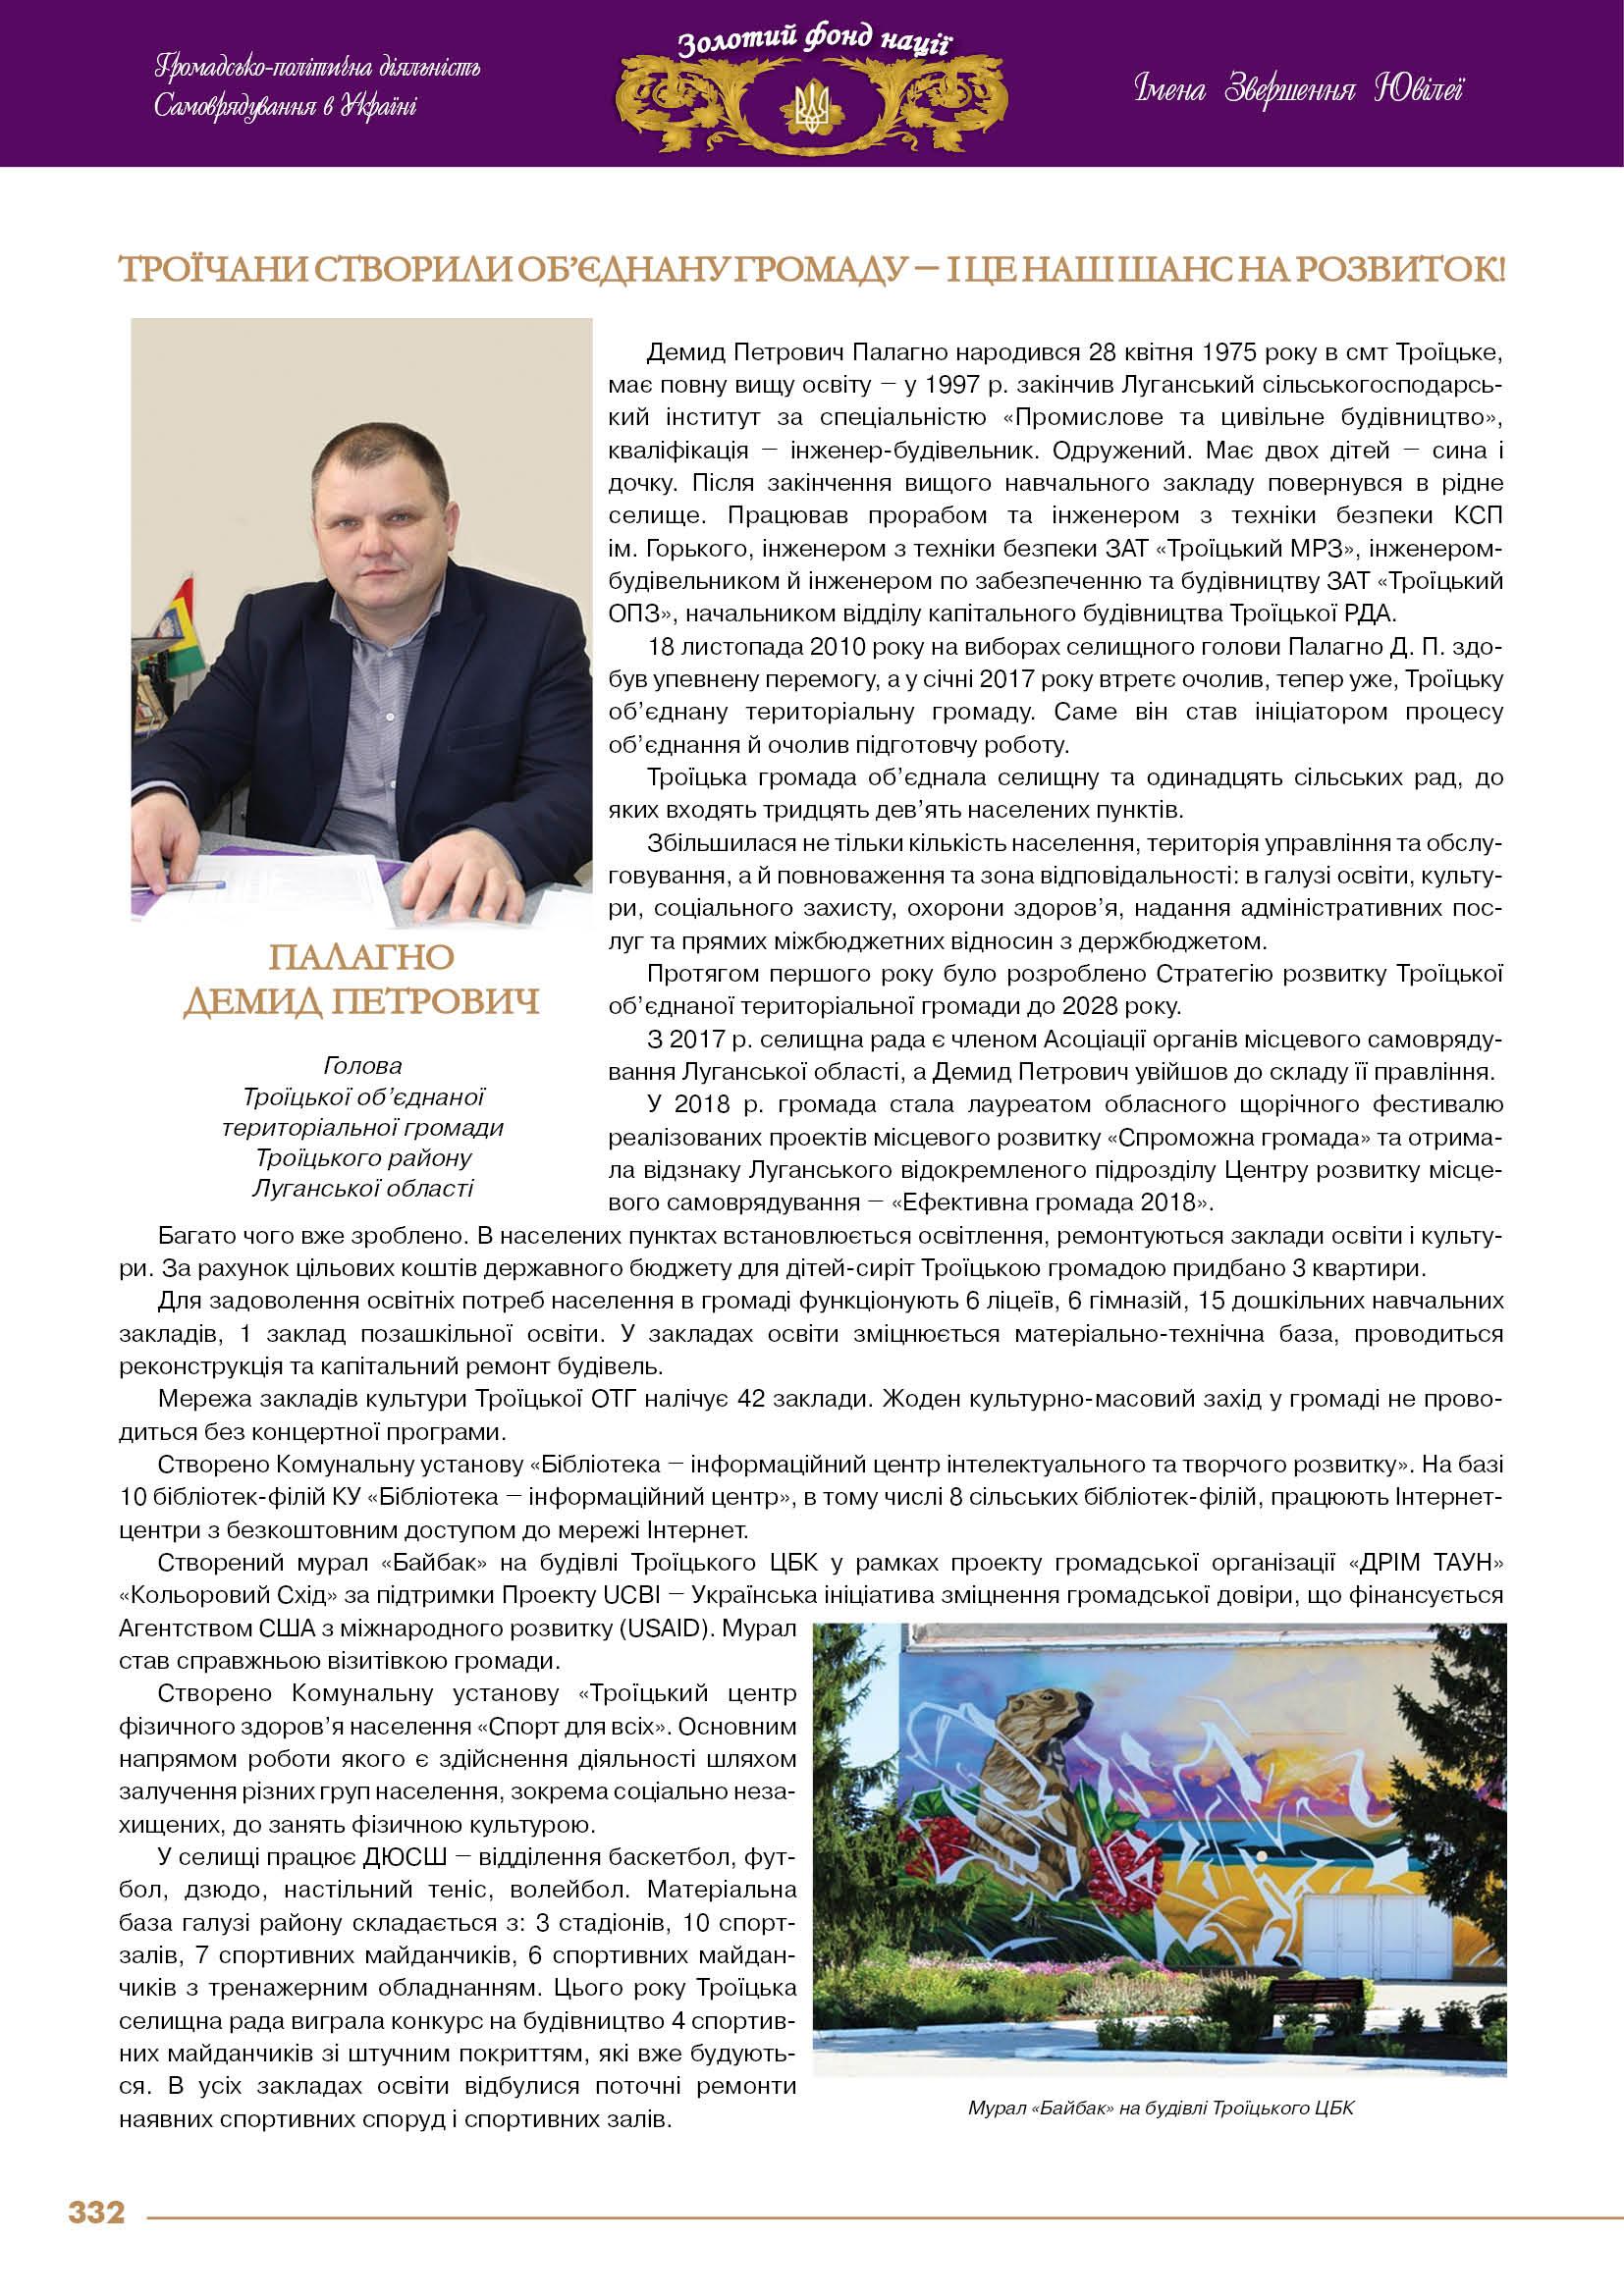 Палагно Демид Петрович